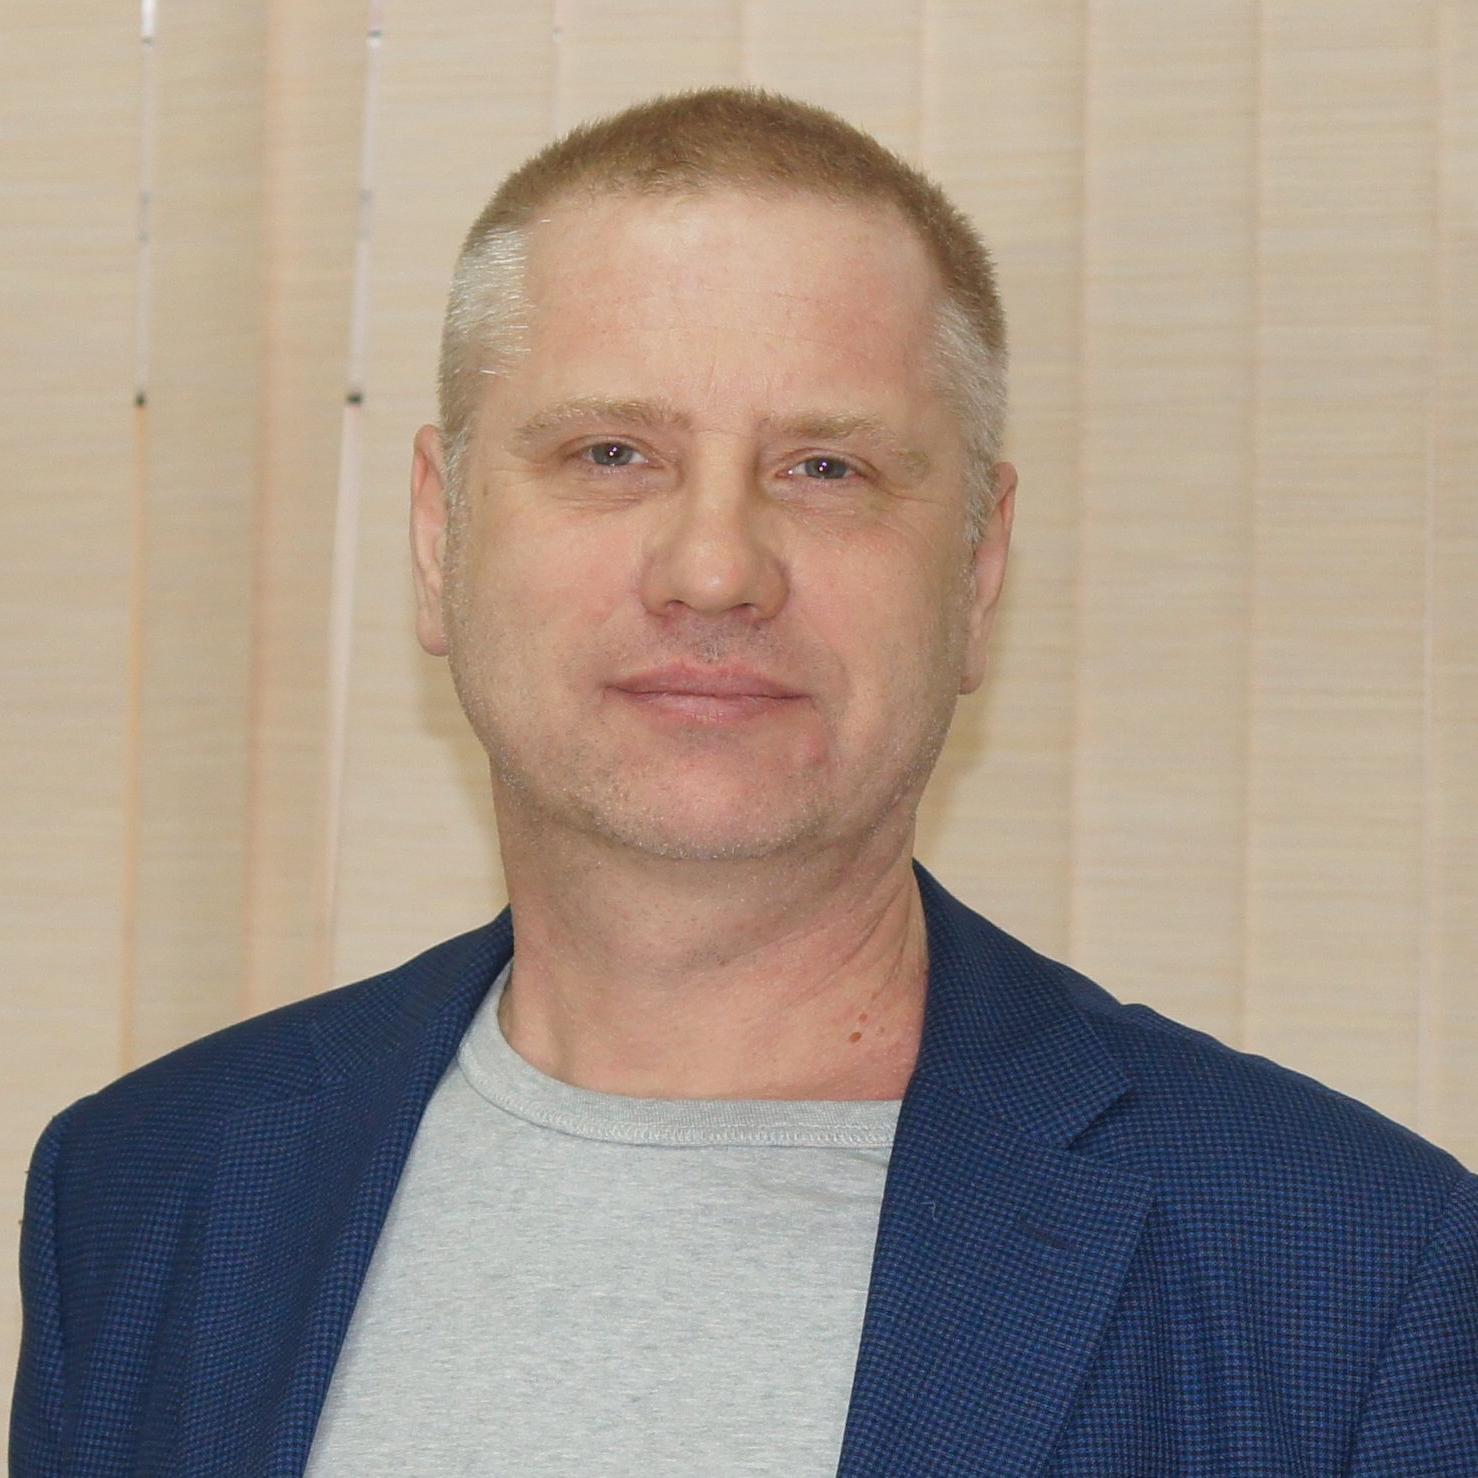 Николай Валаев, WebControl 1 sq